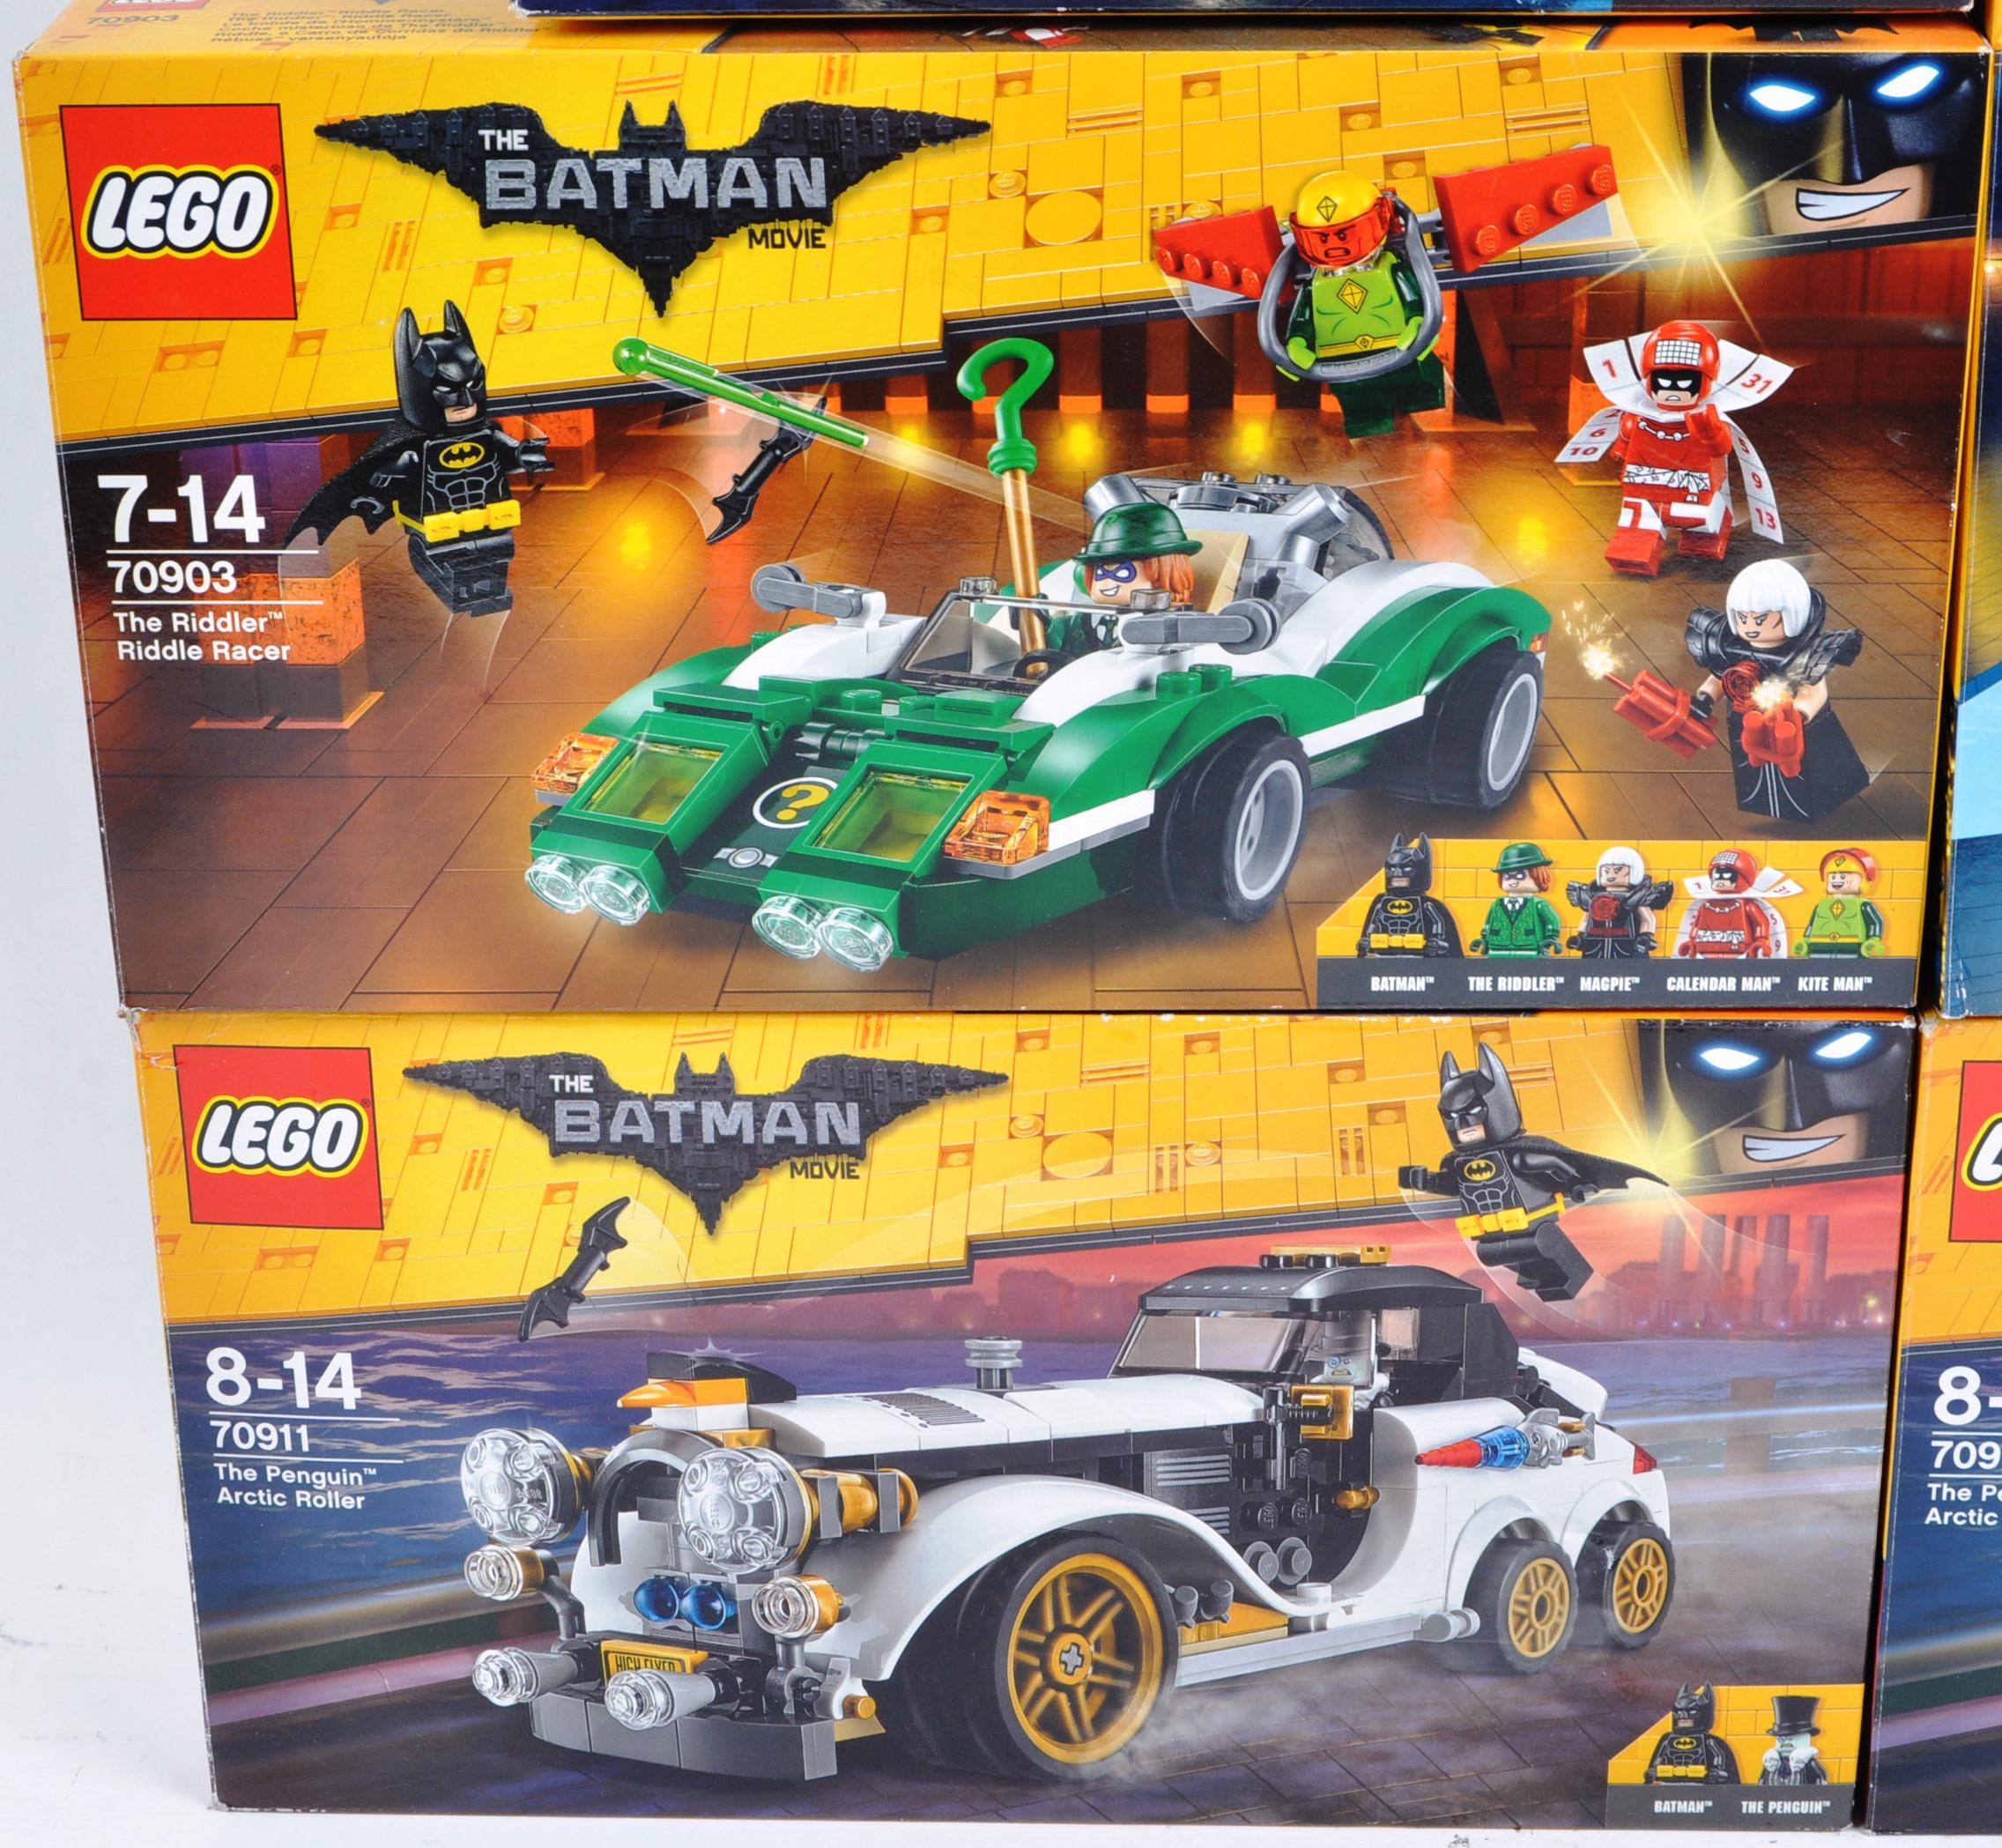 LEGO SETS - THE BATMAN MOVIE - Image 2 of 6